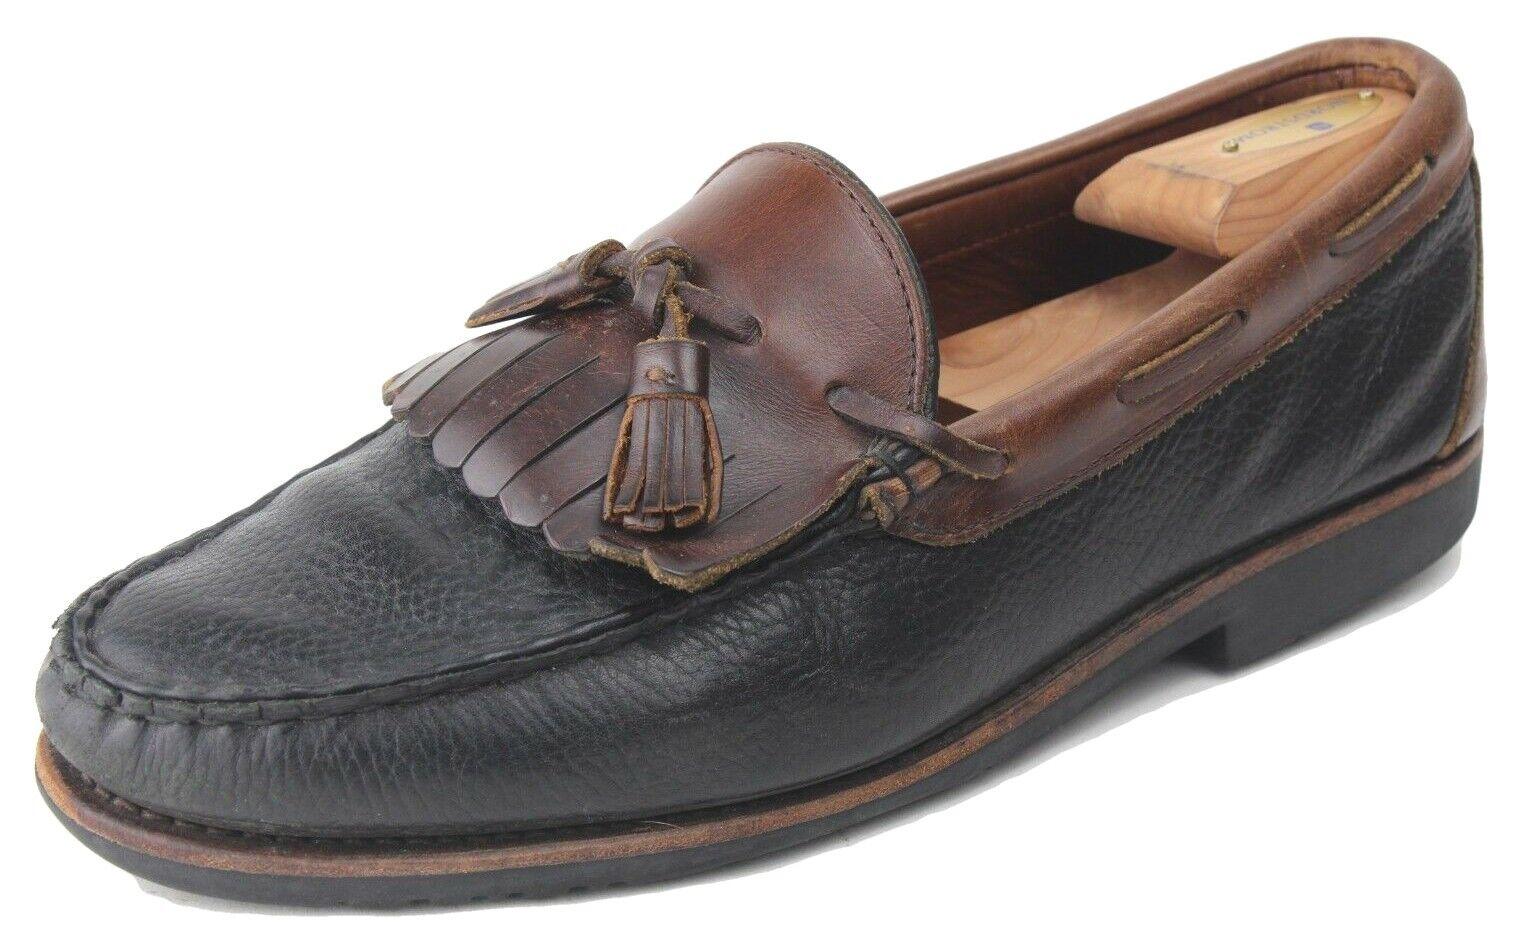 Allen Edmonds Nashua 2 Tone Leather Kiltie Tassel Loafers US Size 11.5 D Medium